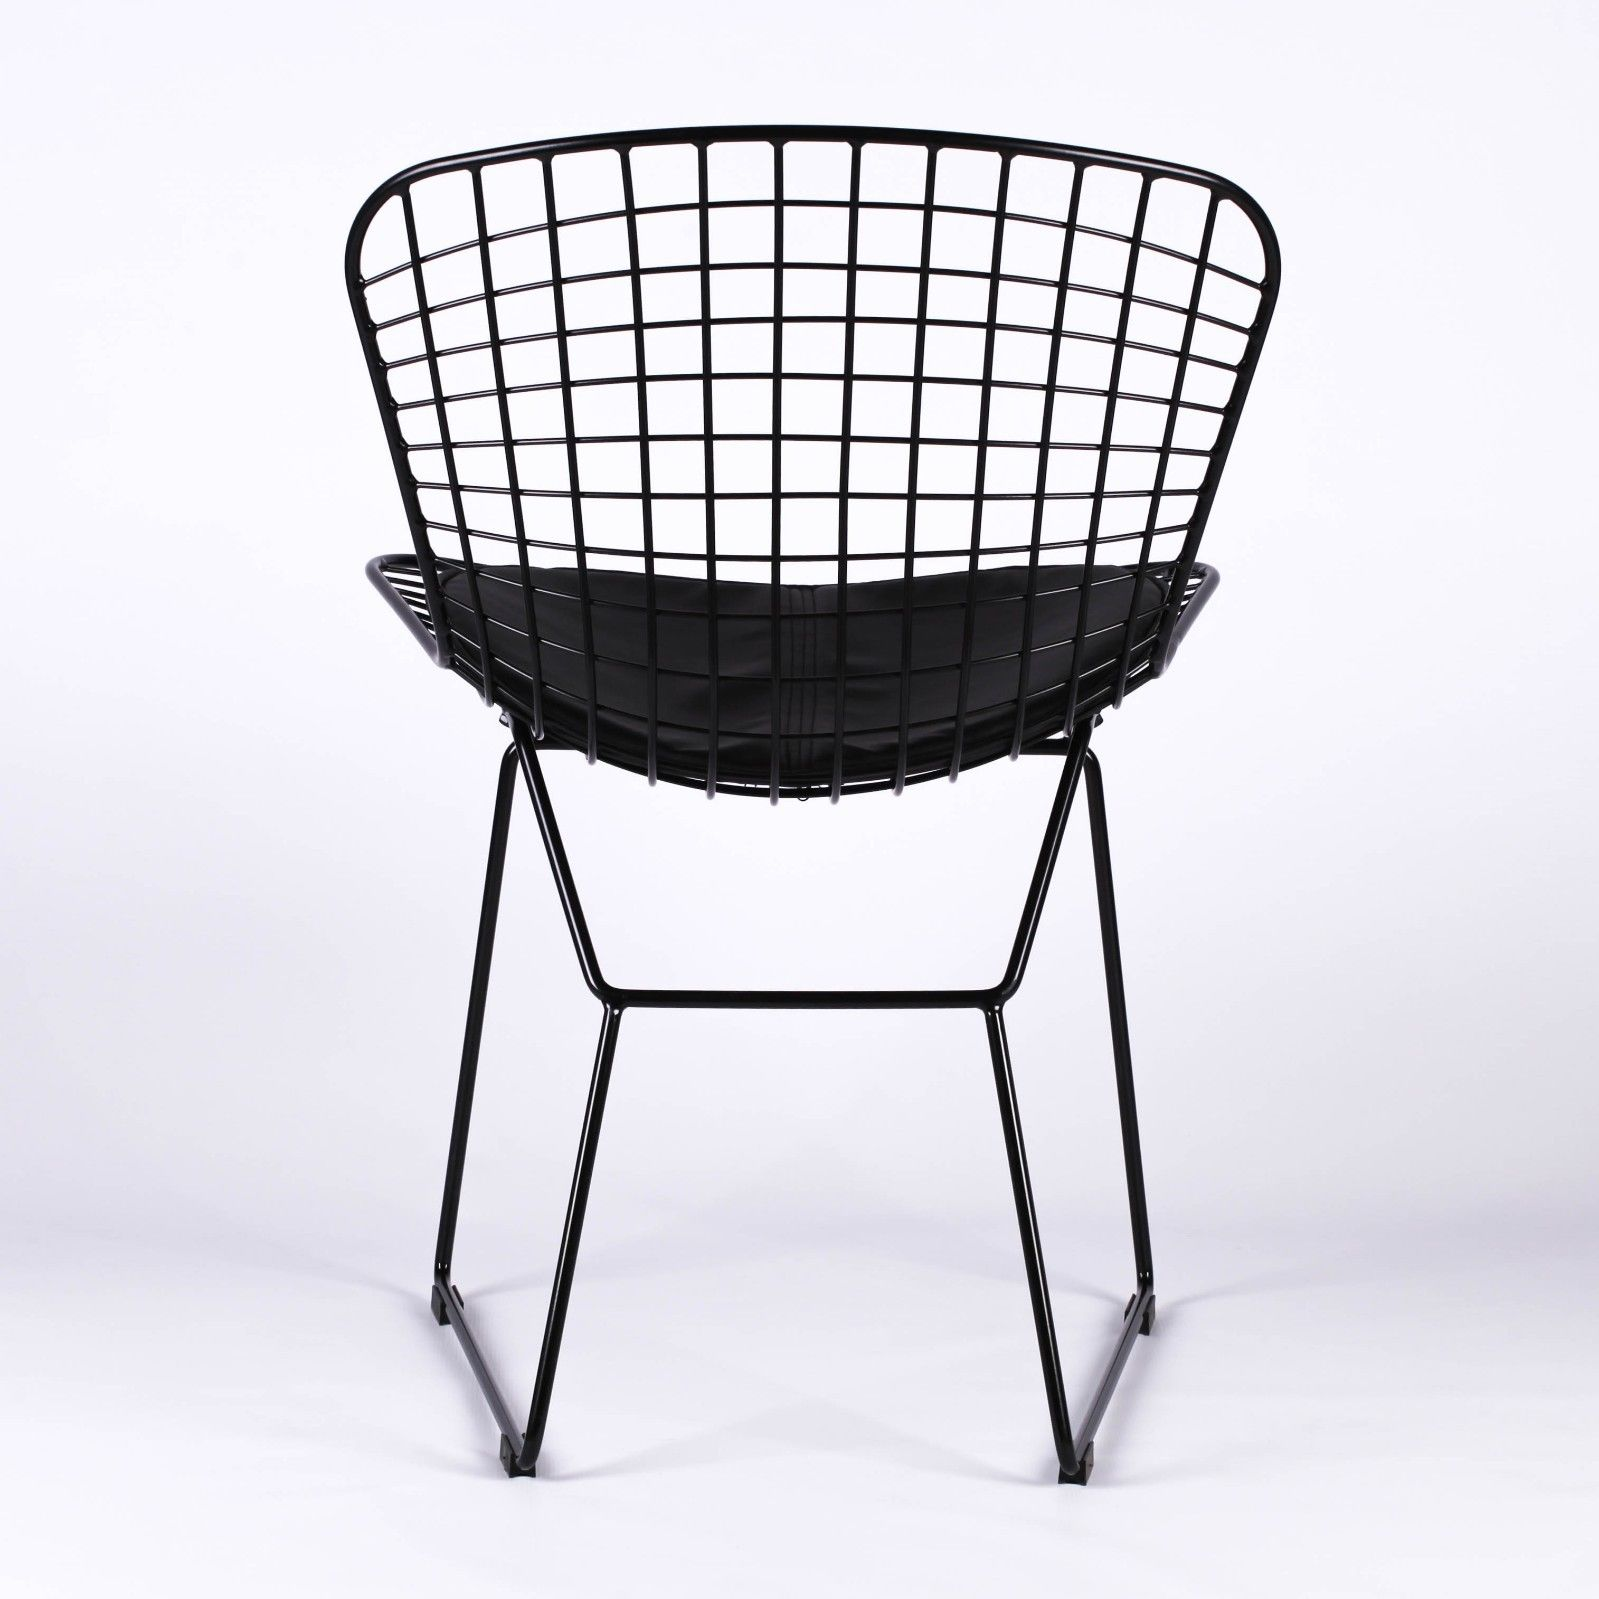 Phenomenal Black Mesh Wire Dining Chair Short Links Chair Design For Home Short Linksinfo